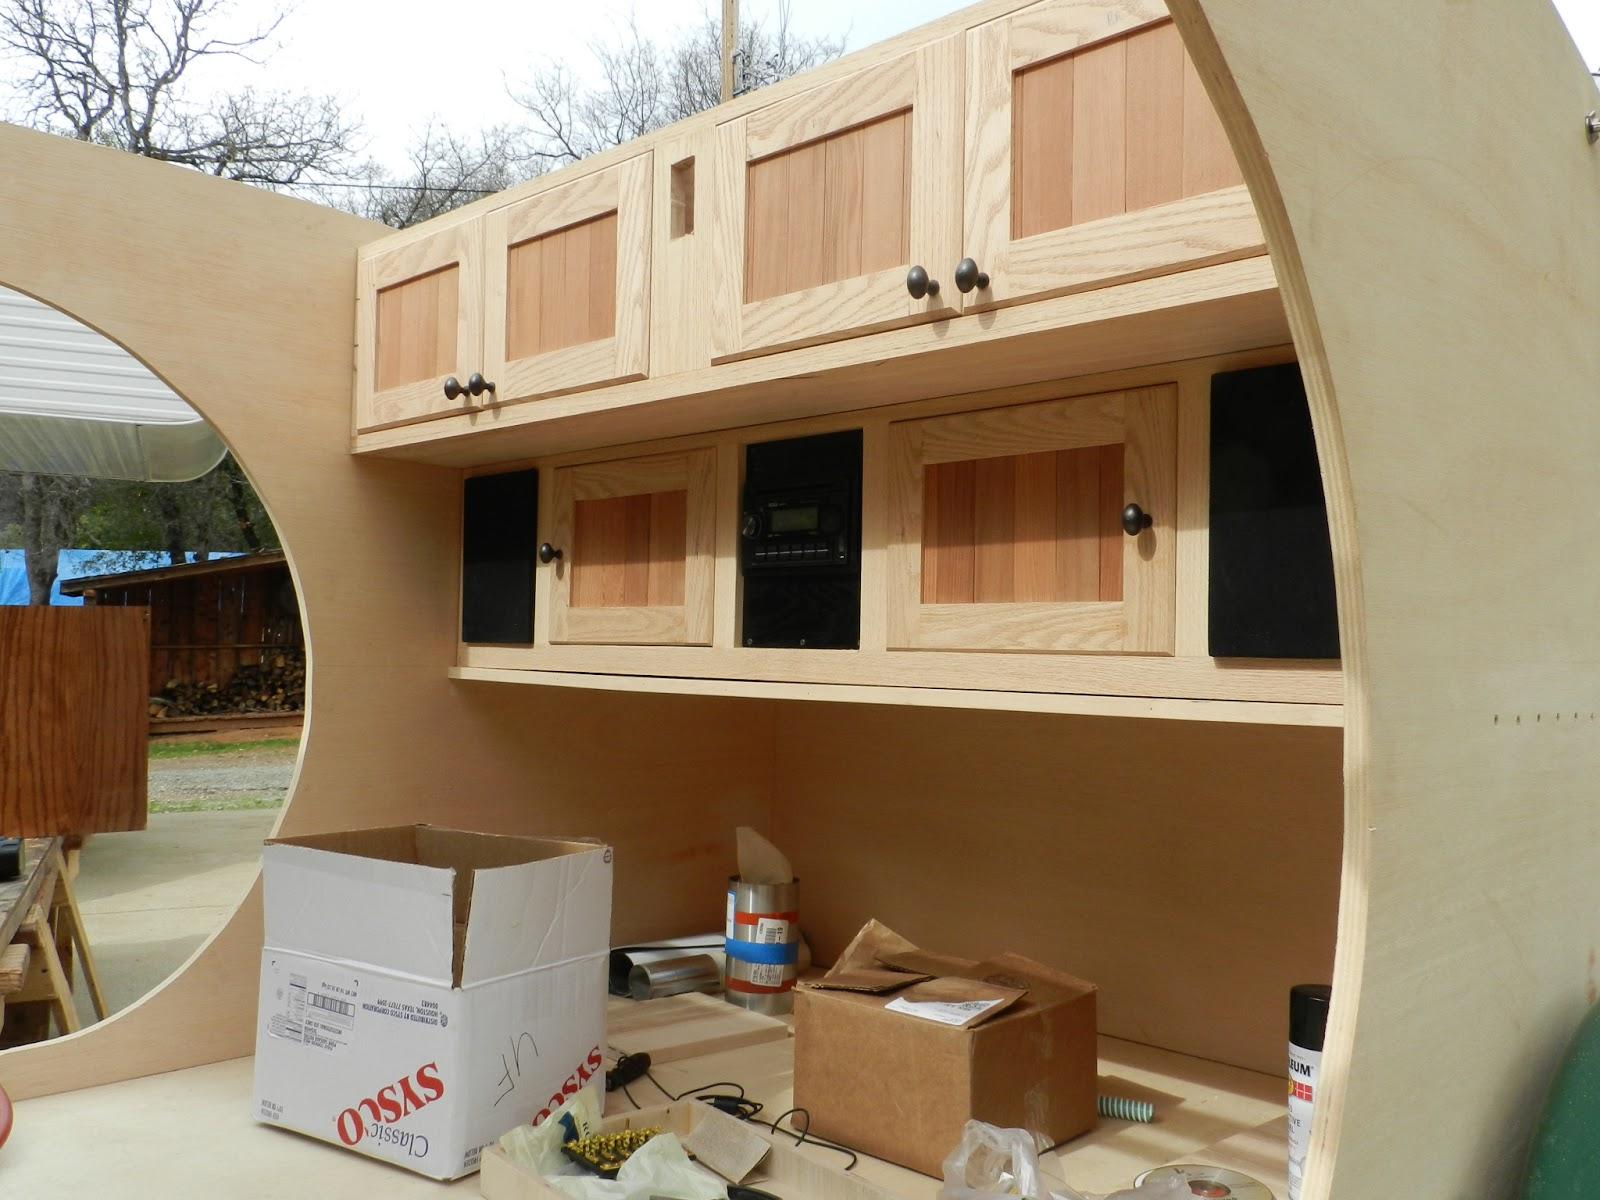 Ed39s teardrop trailer project trailer construction for Teardrop camper interior ideas